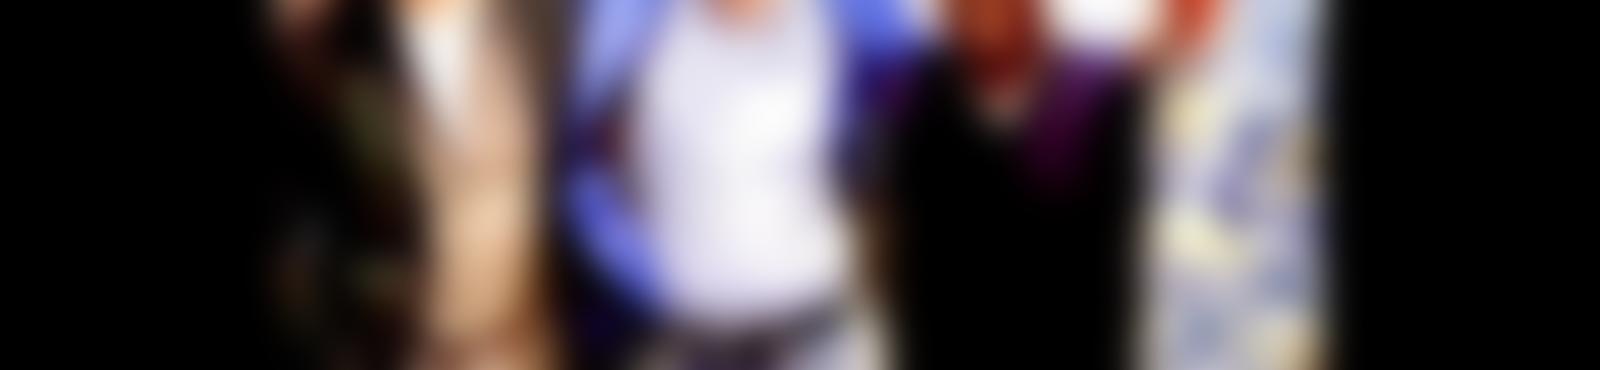 Blurred 7eb53eae fca0 428e 8ecc 8c446a704328